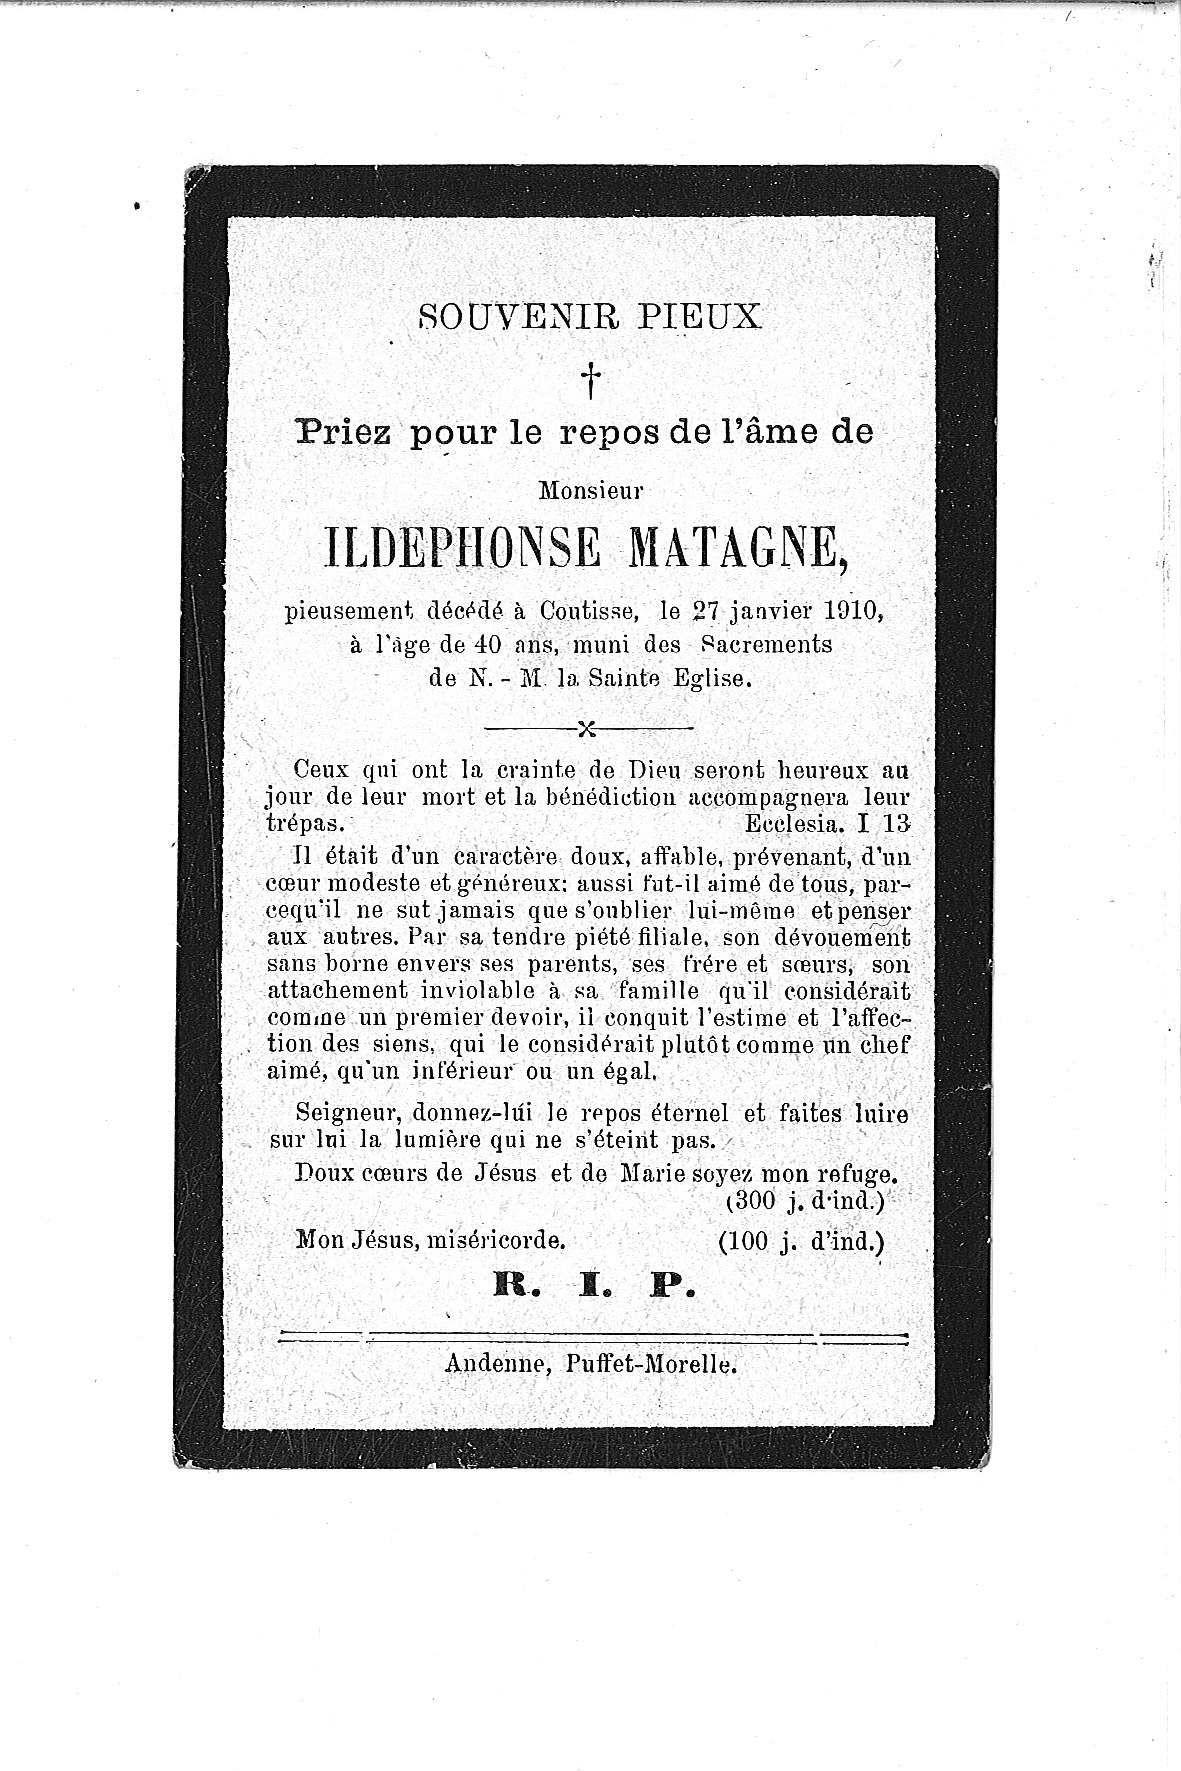 Ildephonse(1910)20120227085536_00052.jpg